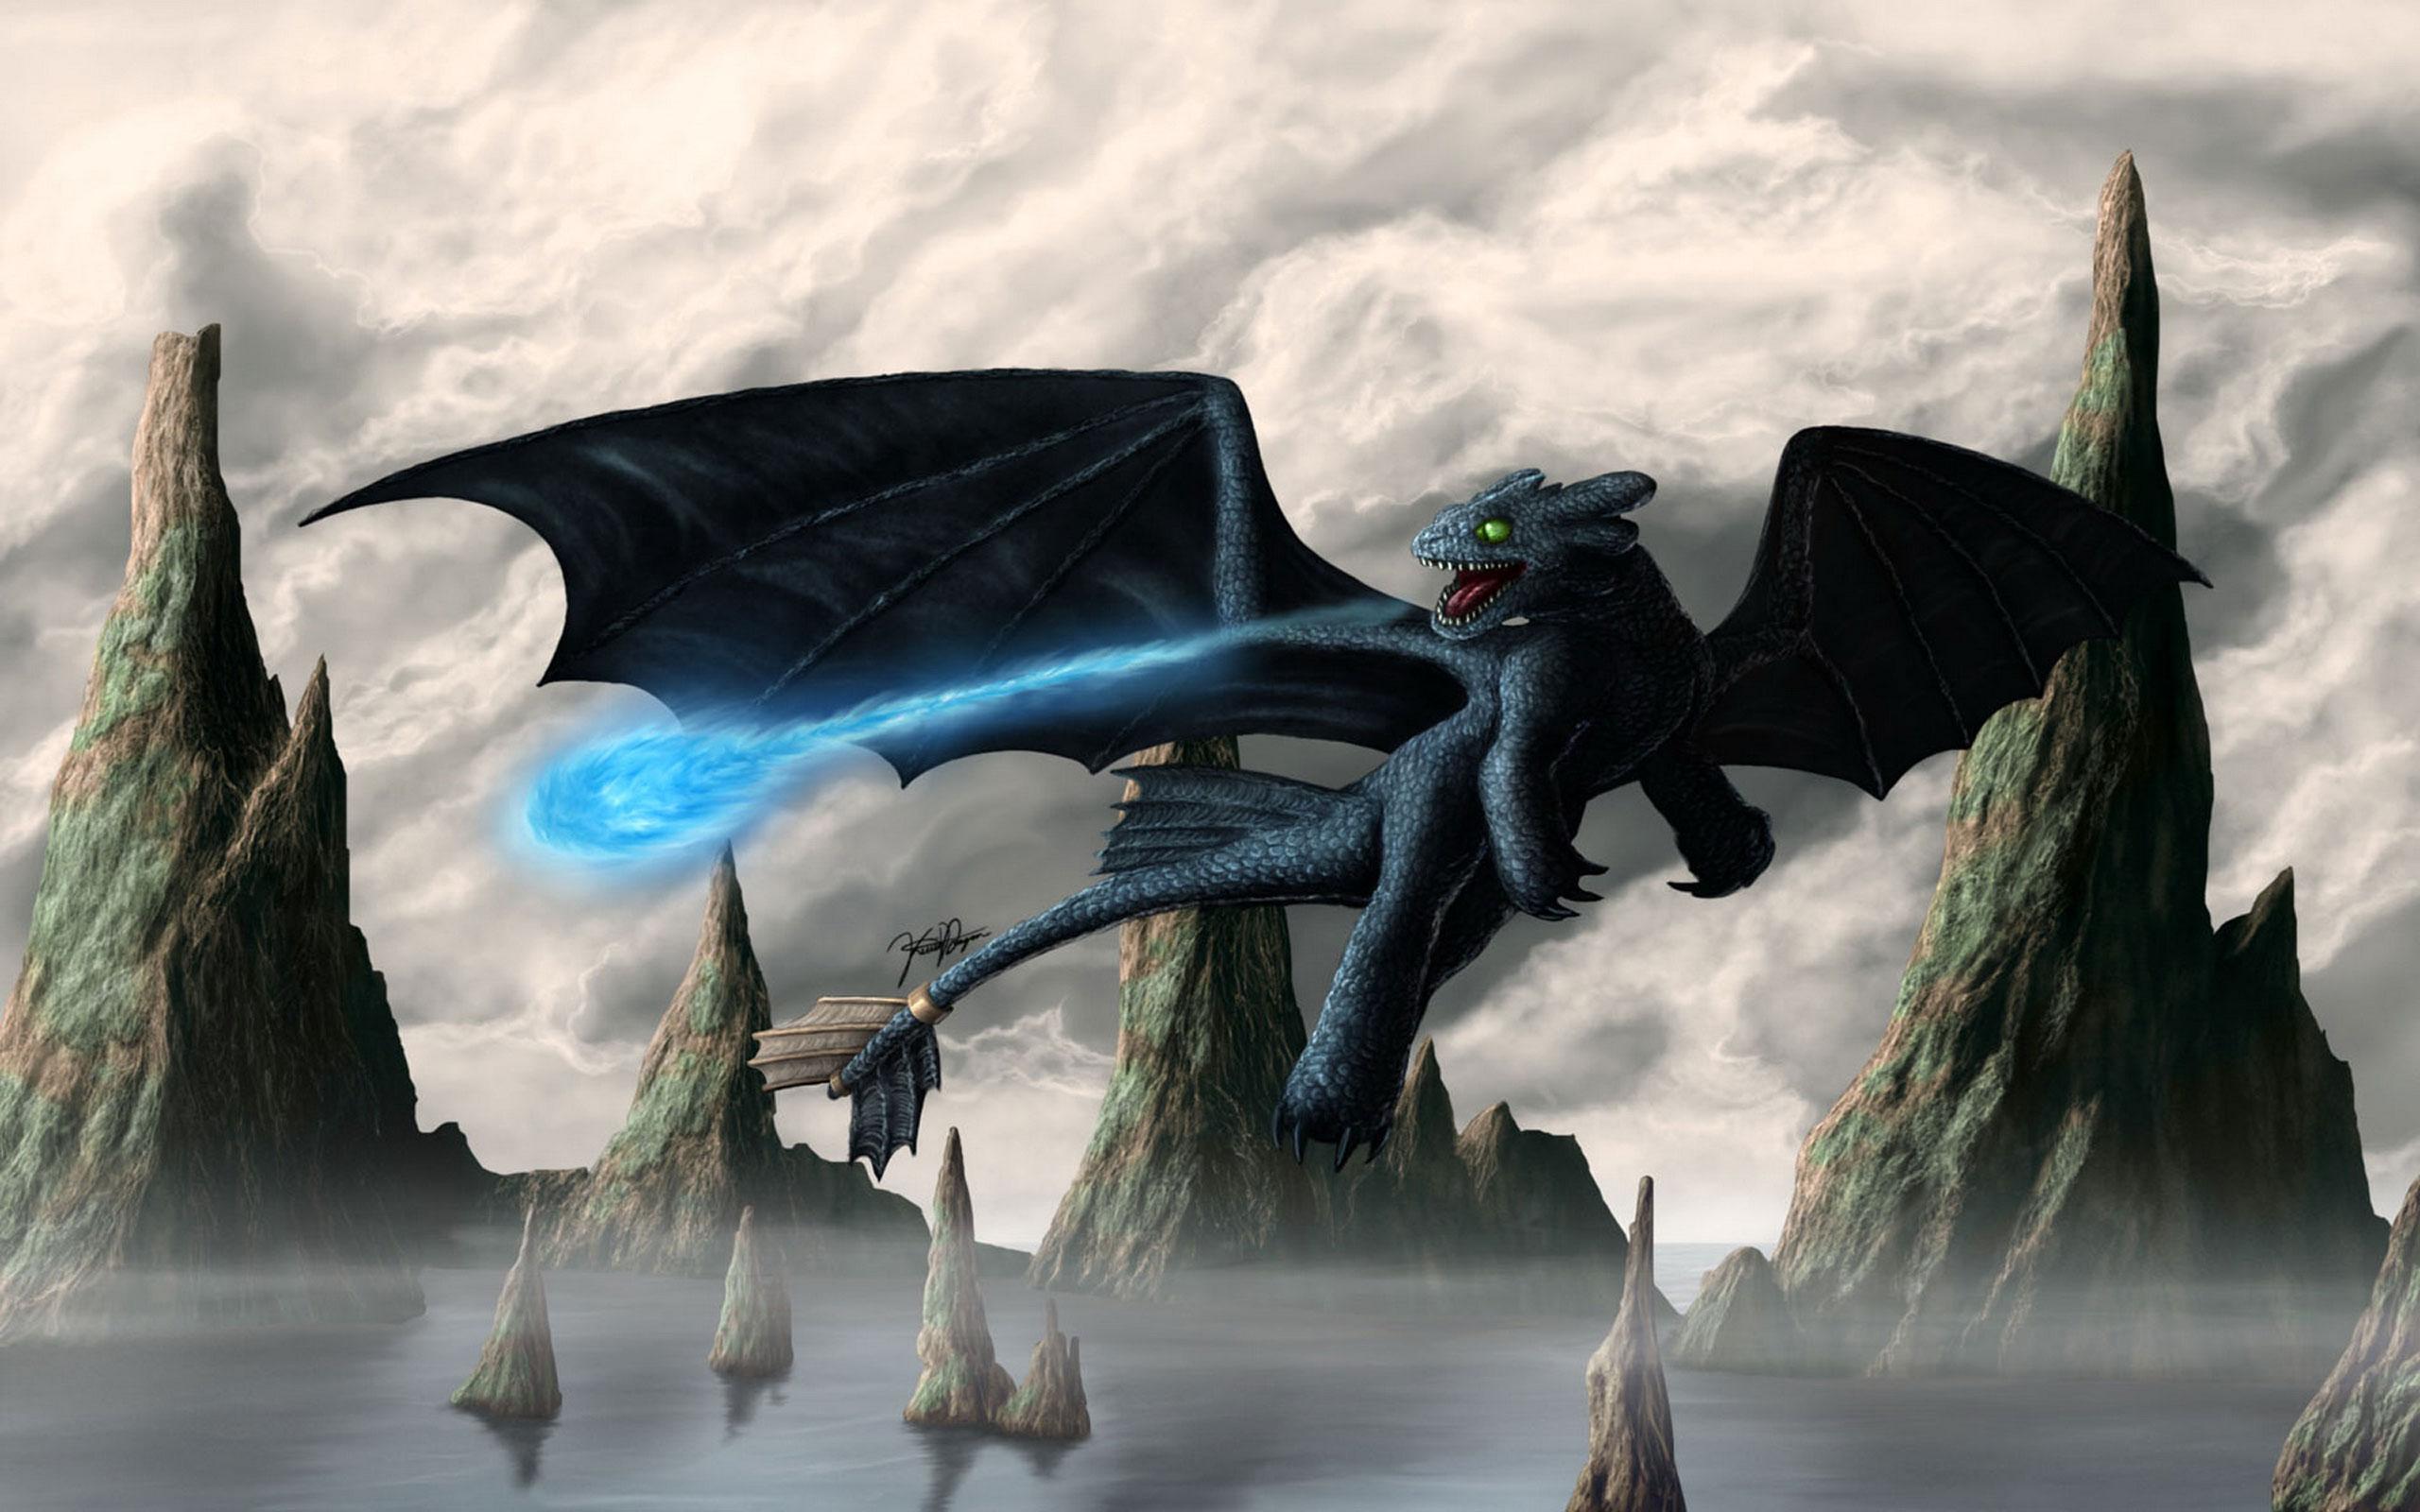 Fury Toothless Hd Night Wallpaper